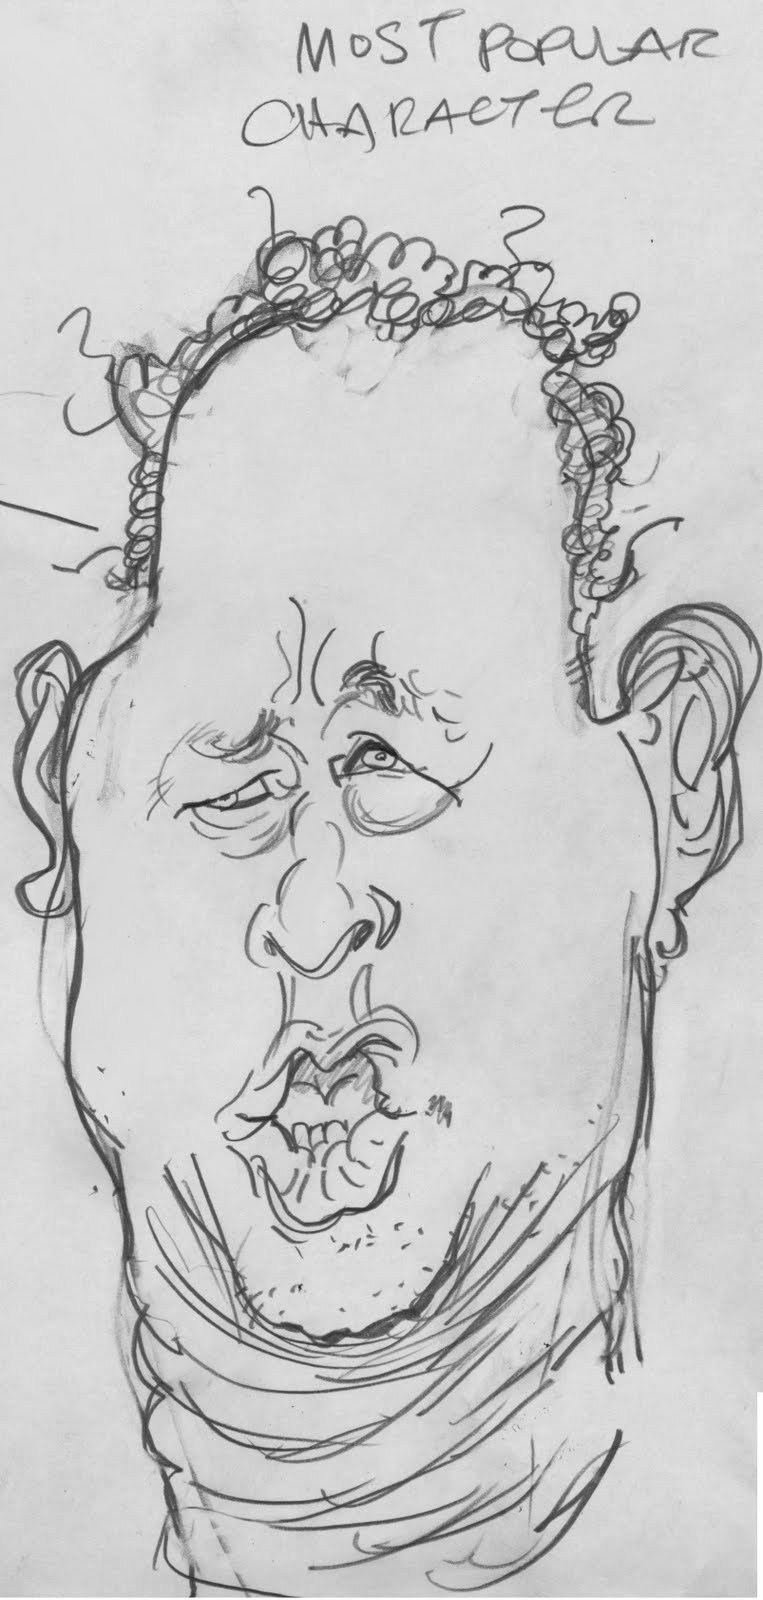 CARICATURISTAS Caricatures1